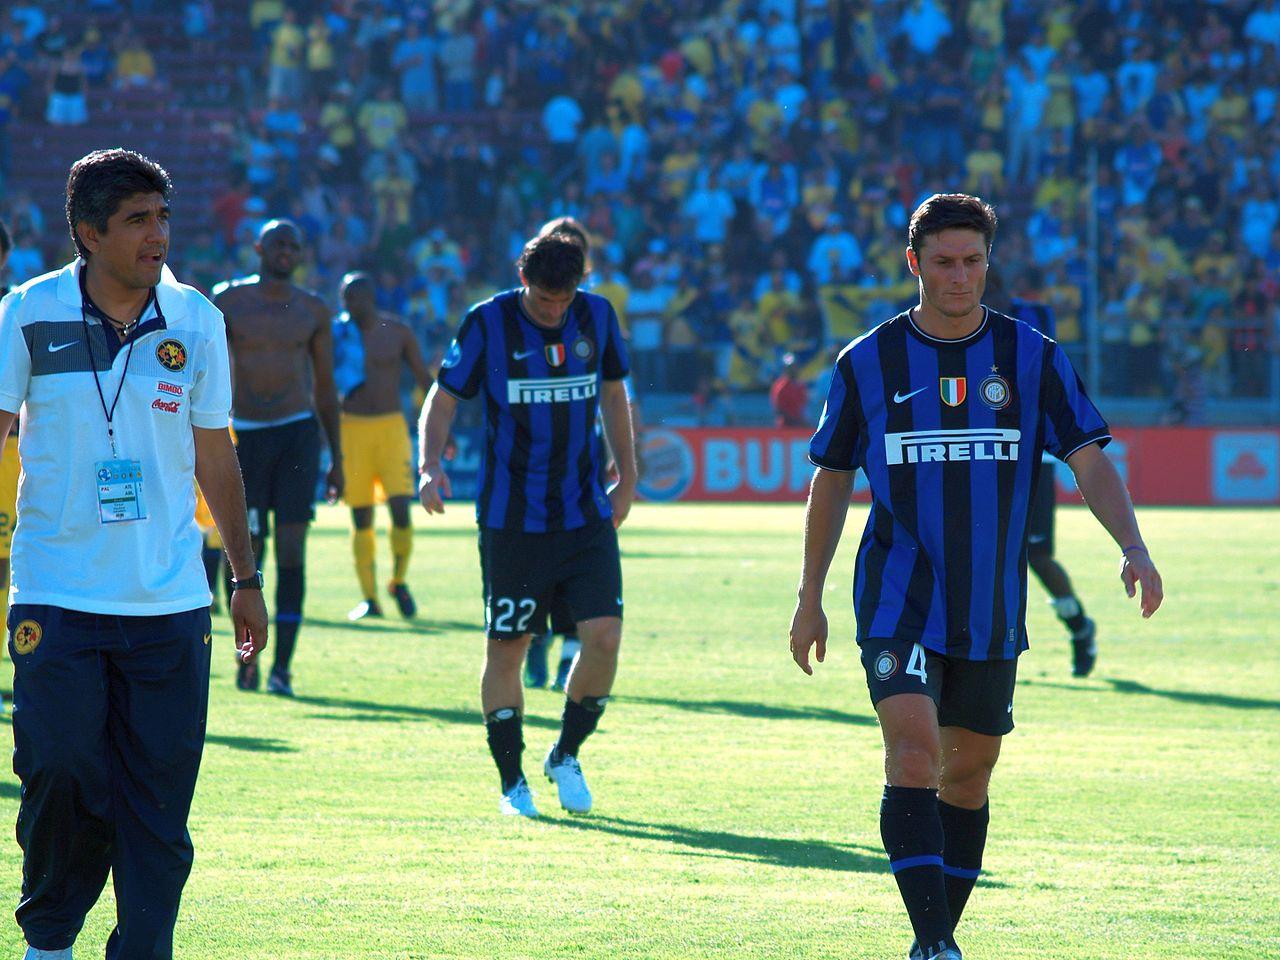 Club_América_v_Inter_Milan_-_2009_-_Javier_Zanetti.jpg